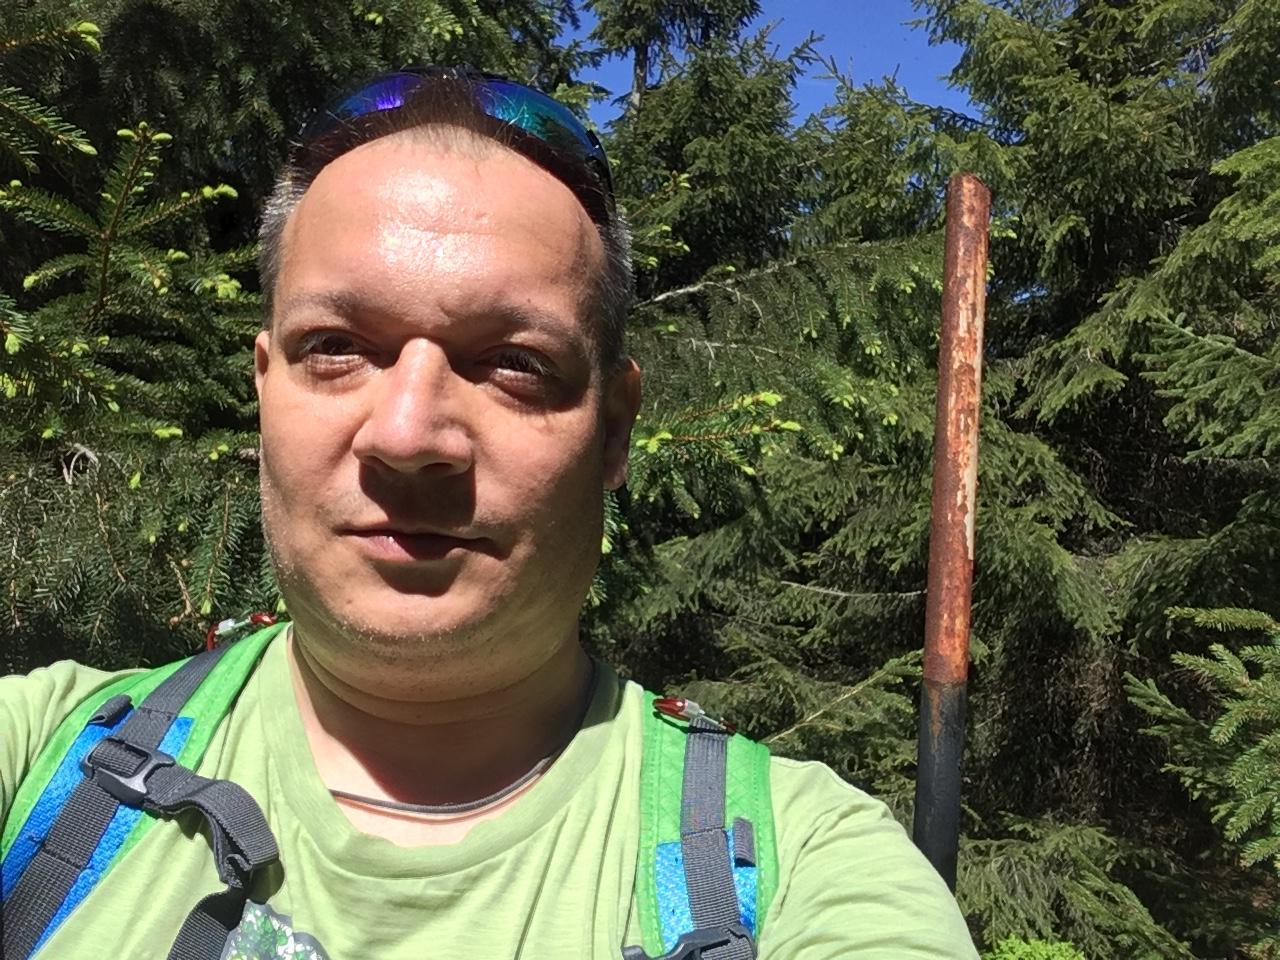 Pery na vrcholu Malchor (13.5.2018 12:08)